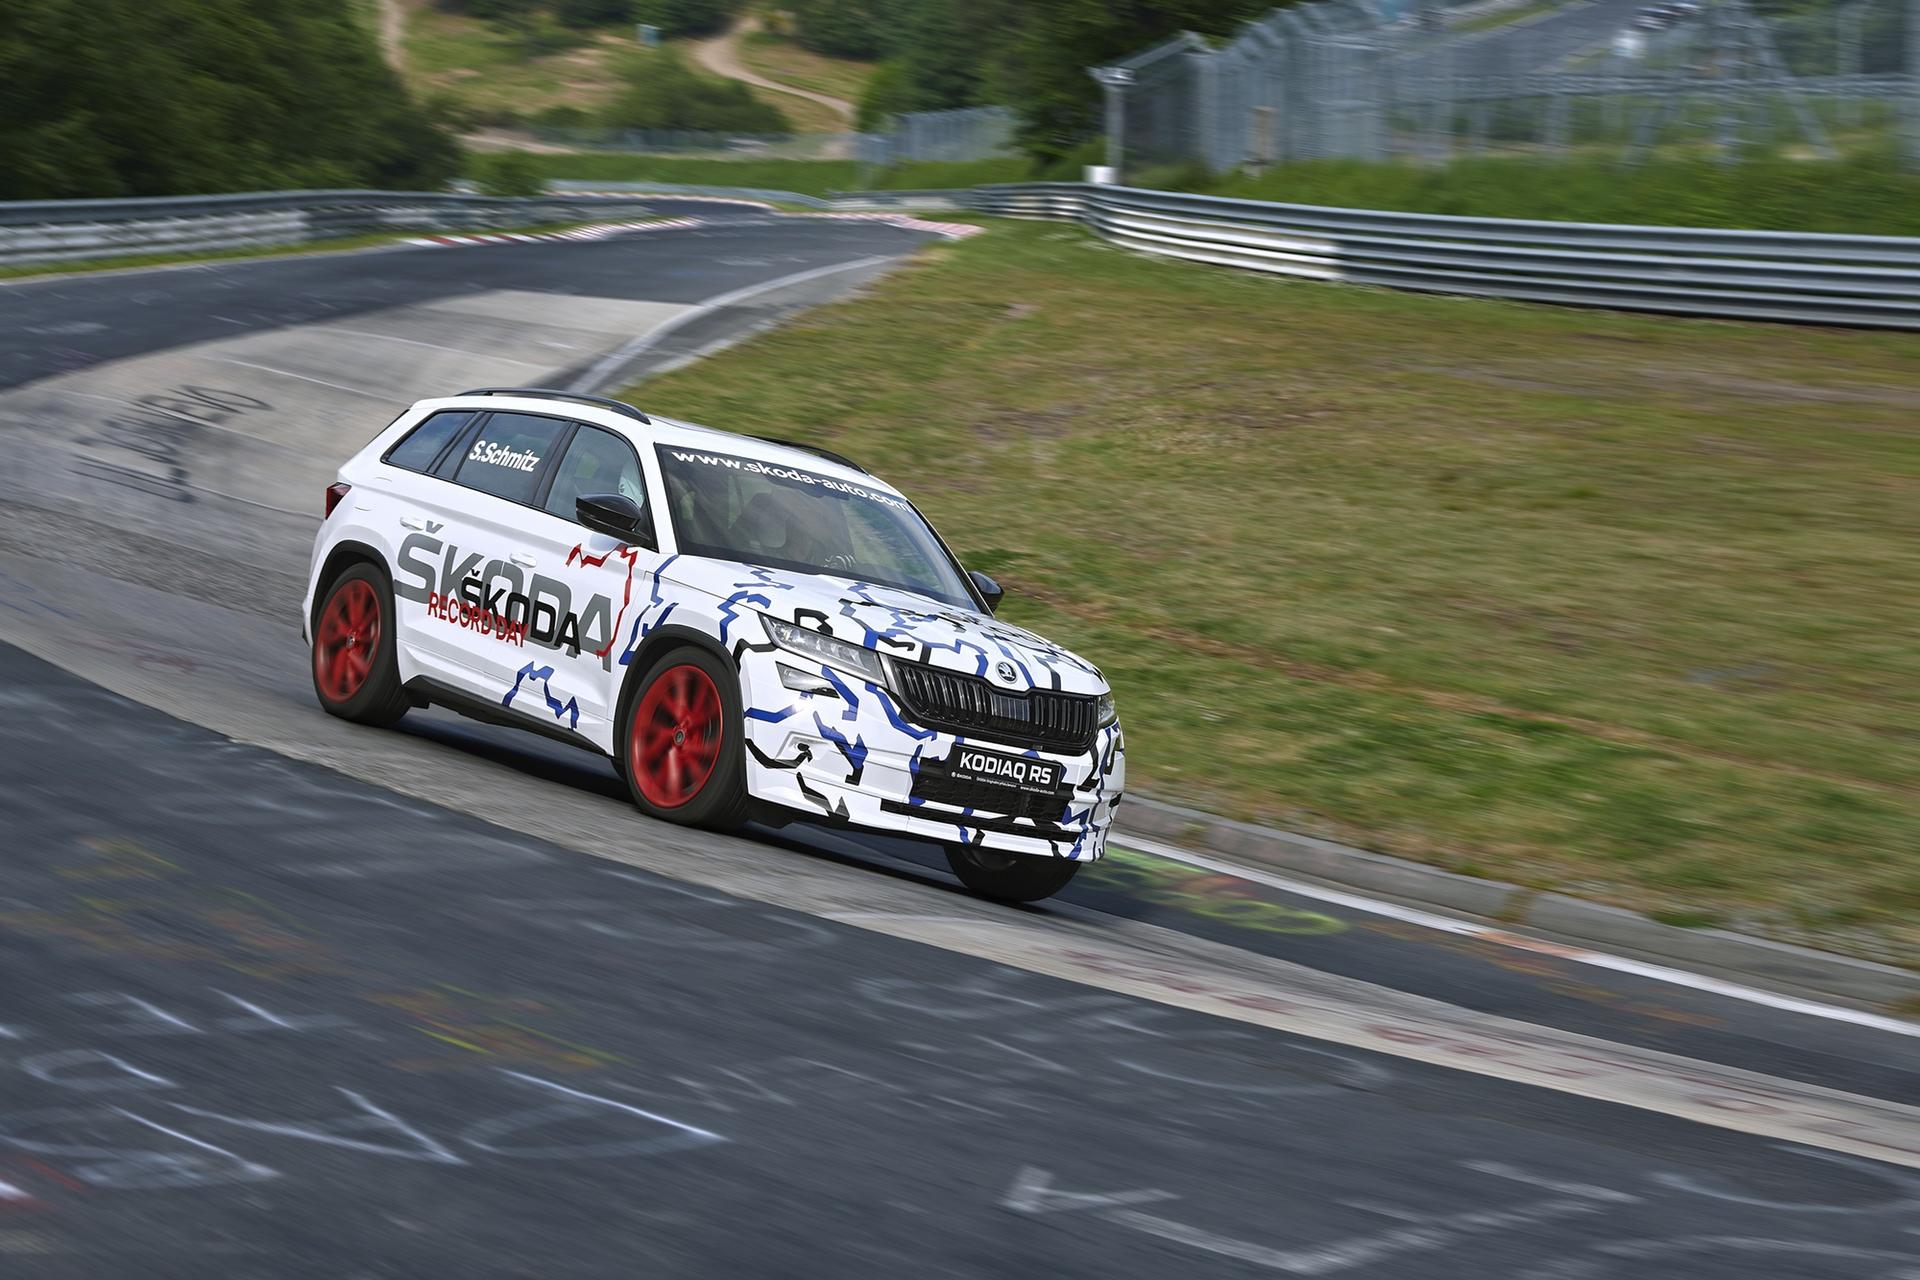 Skoda_Kodiaq_RS_Nurburgring_0040